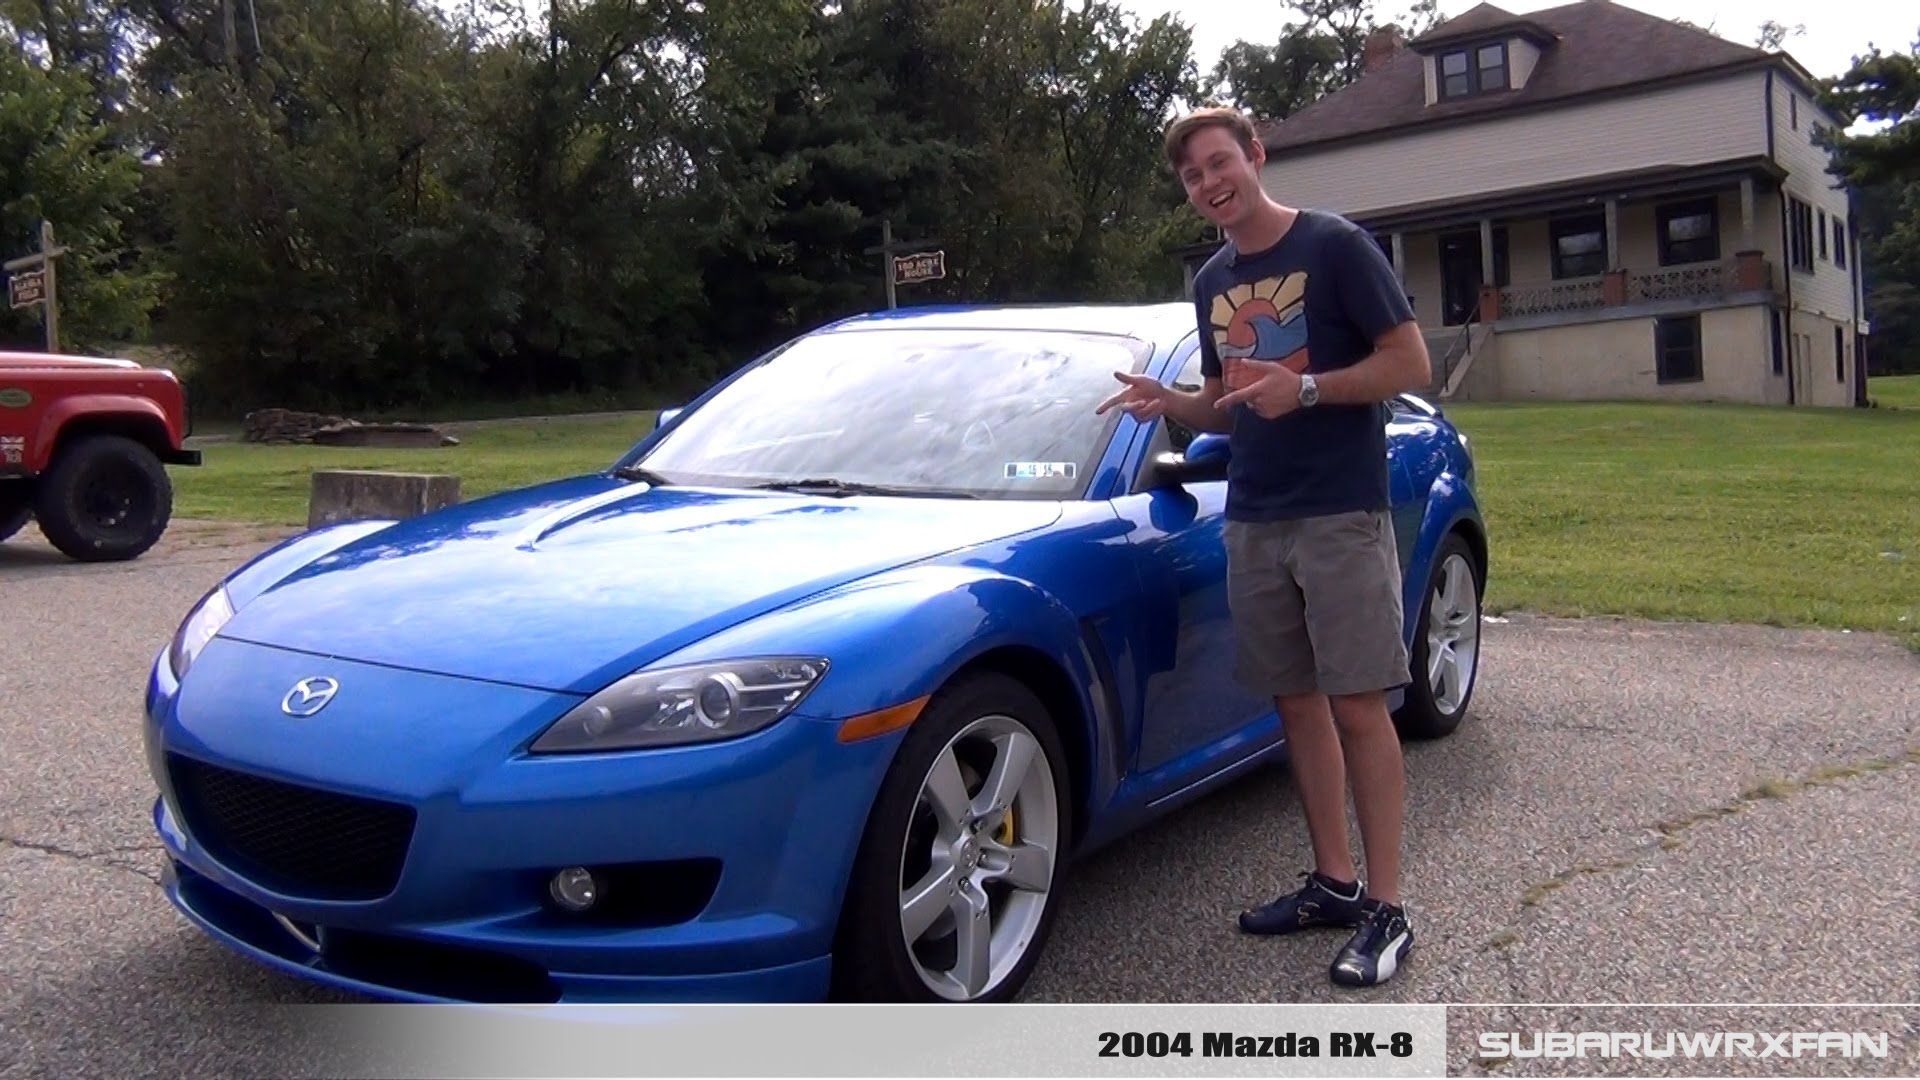 review 2004 mazda rx 8 rx8 rx7 mazda rx 7 extra 8 rotary rh pinterest co uk Mazda RX-8 Manual Transpission Mazda Service Manual PDF